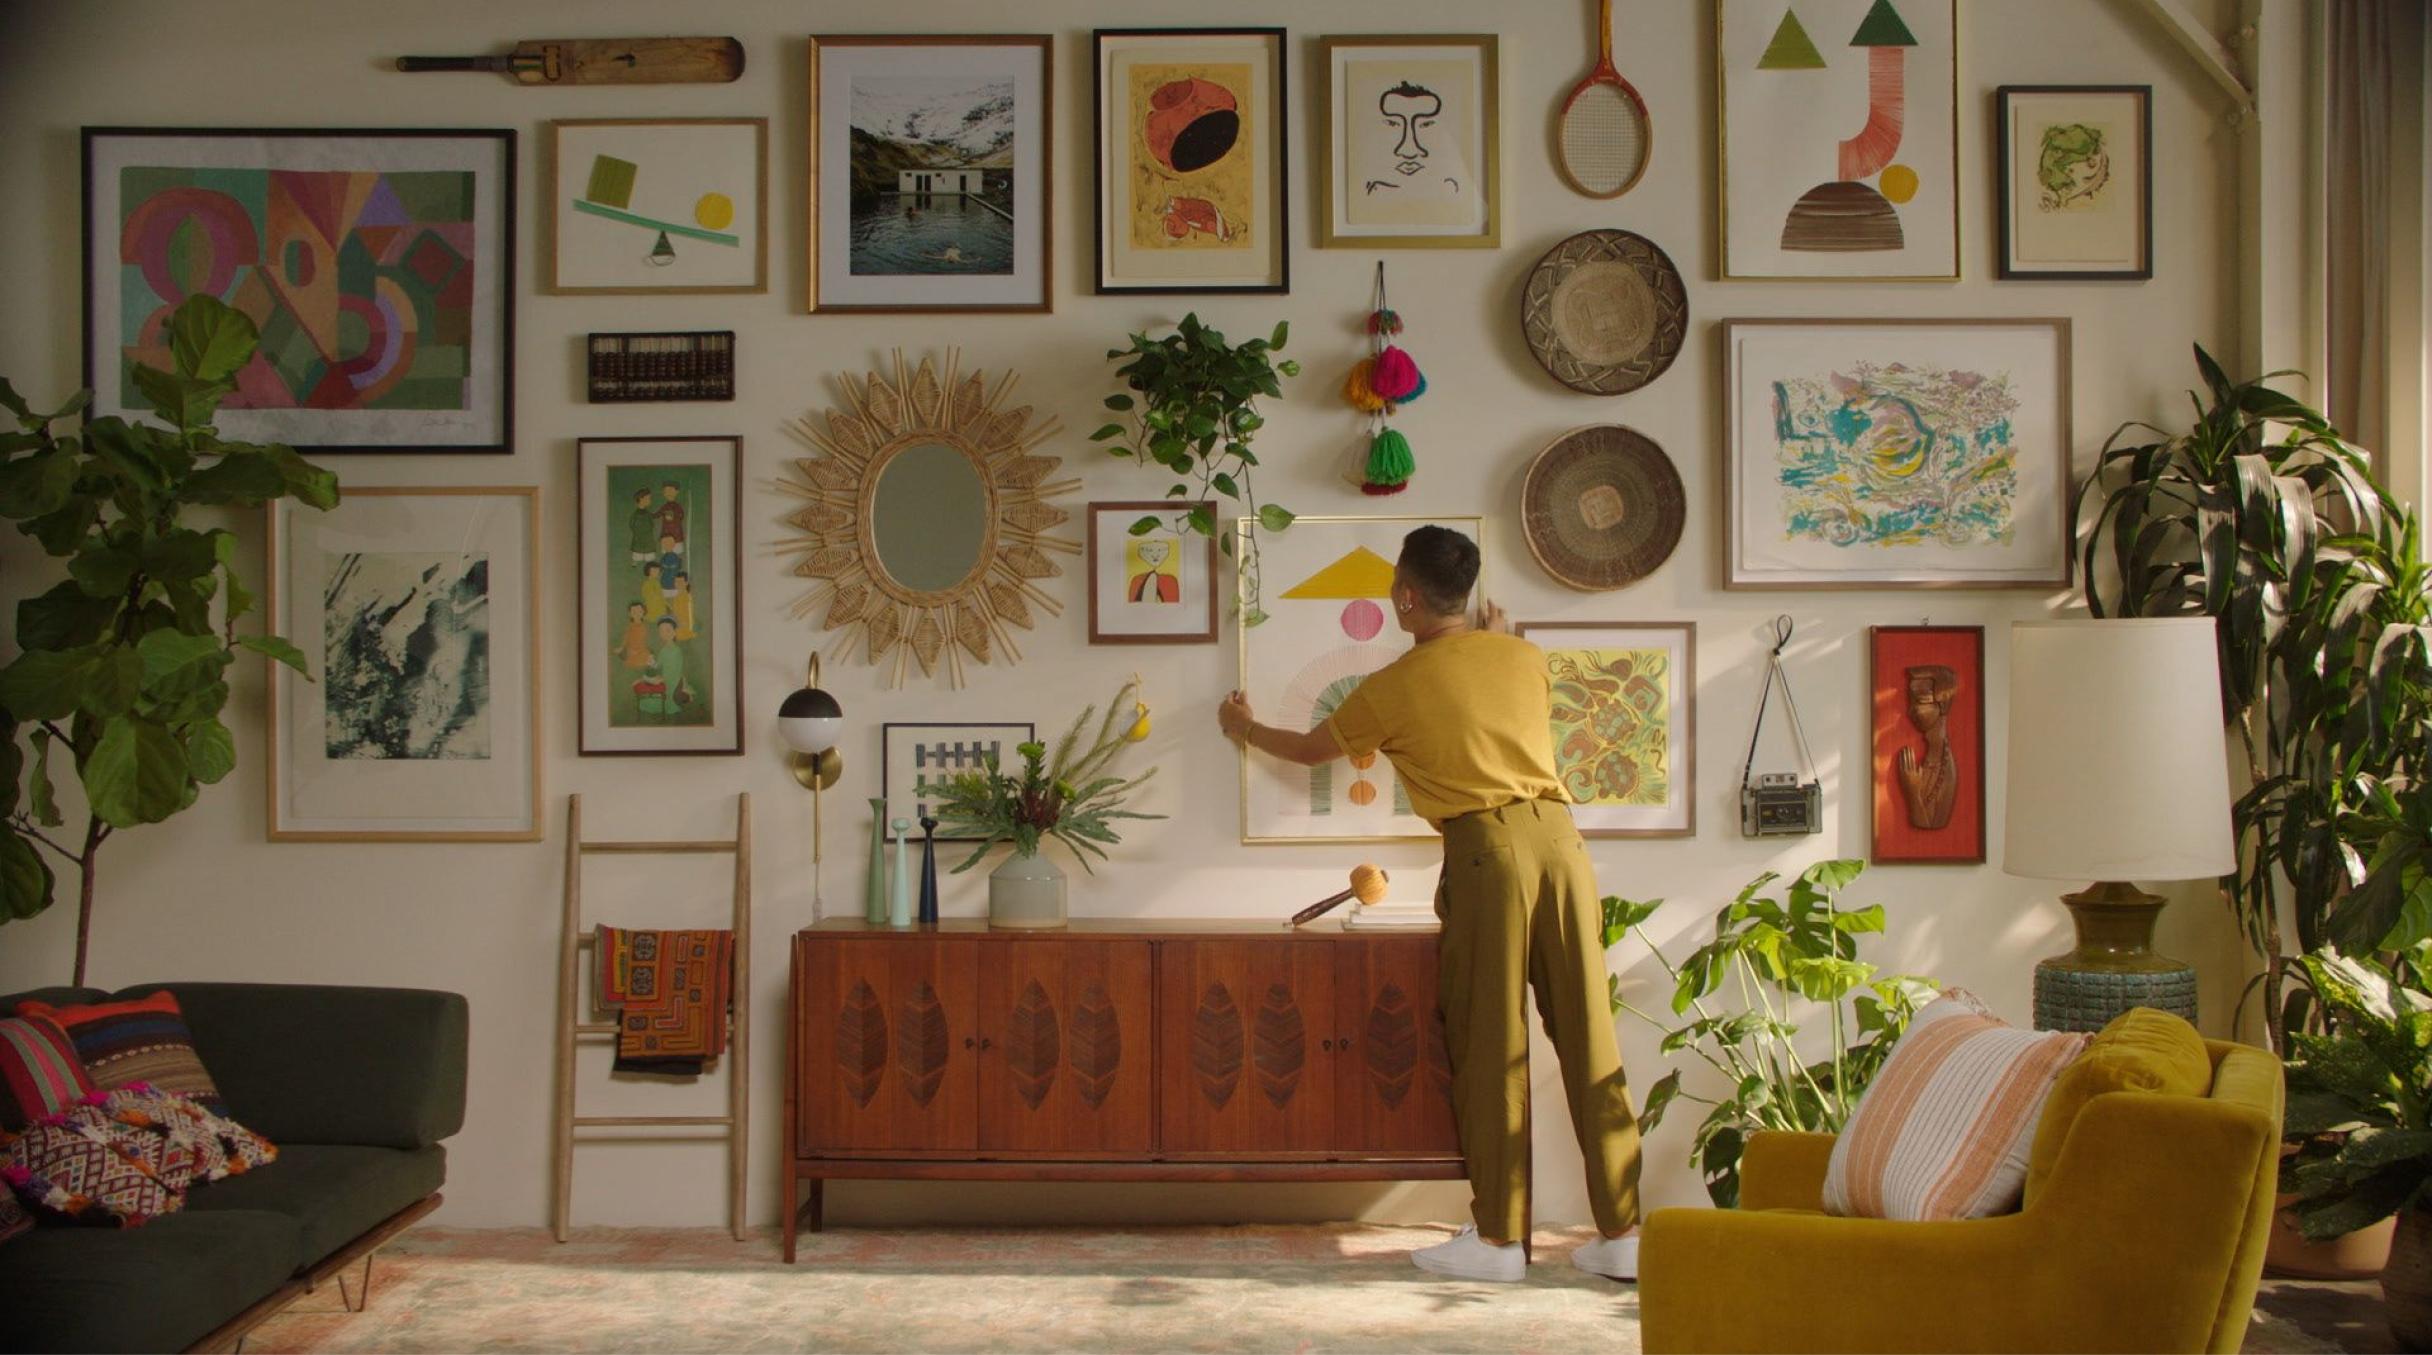 Dabito hangs art on his gallery wall